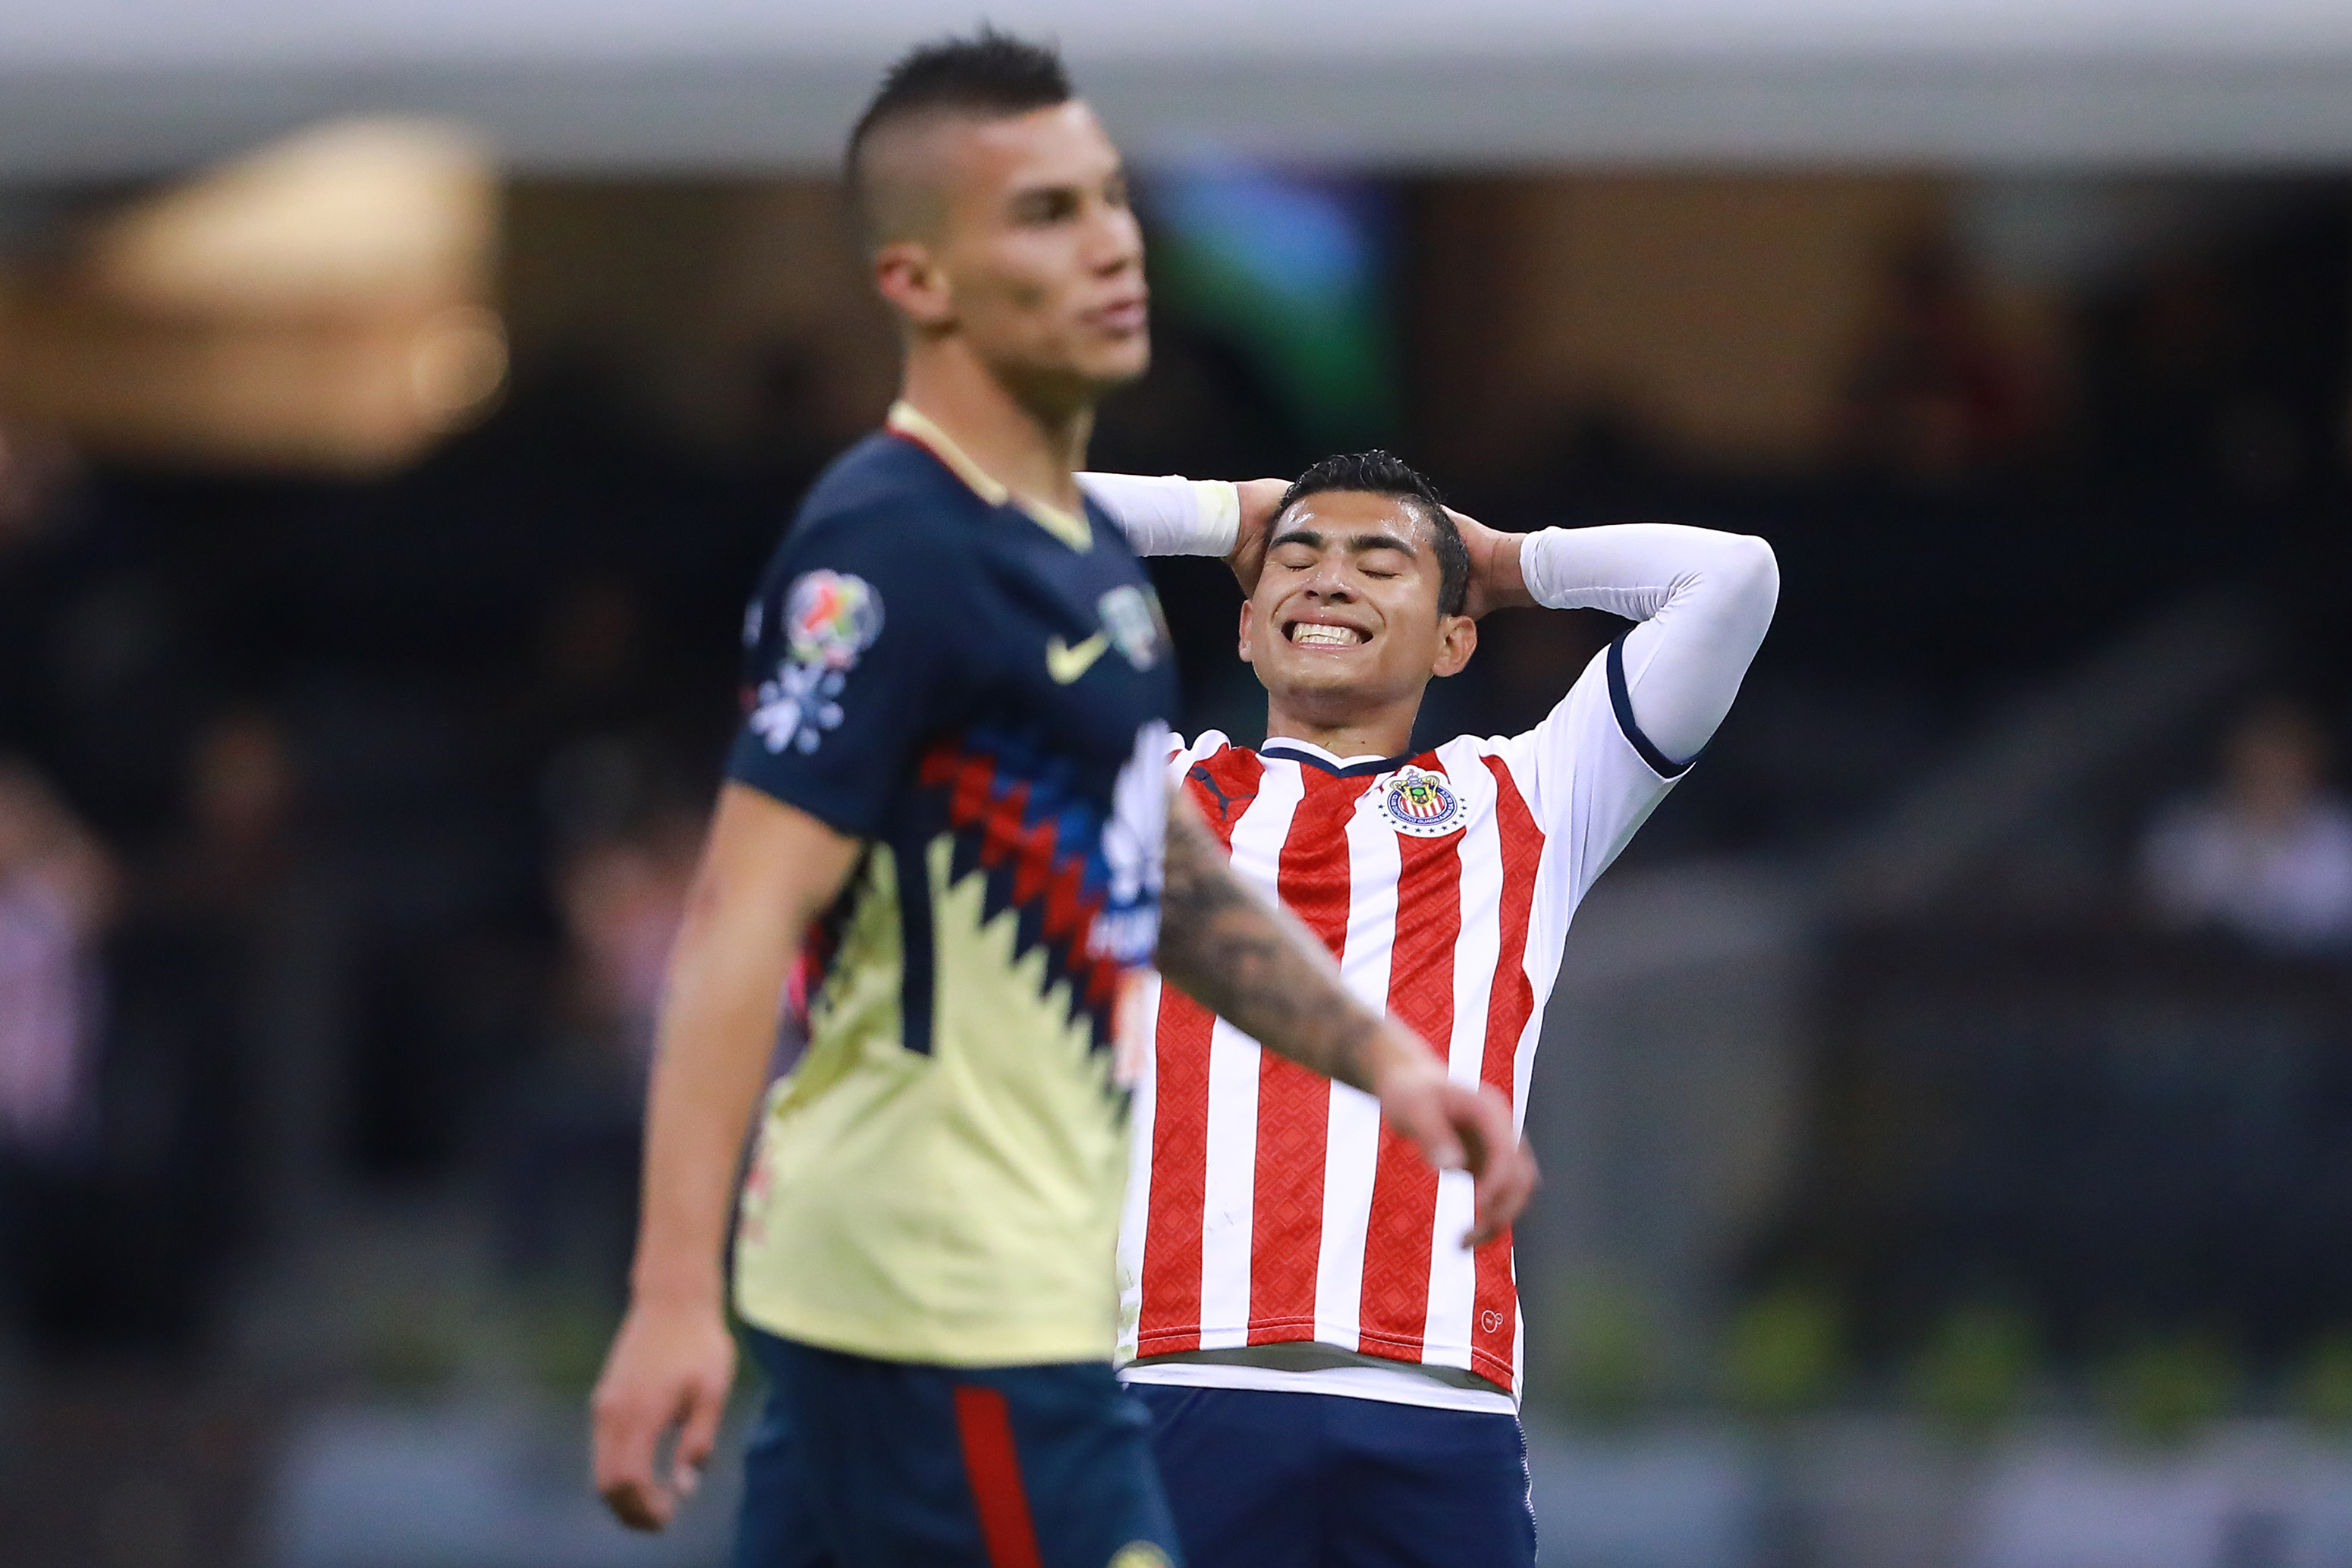 Var América Vs Chivas Clásico Nacional Liga MX Los Pleyers